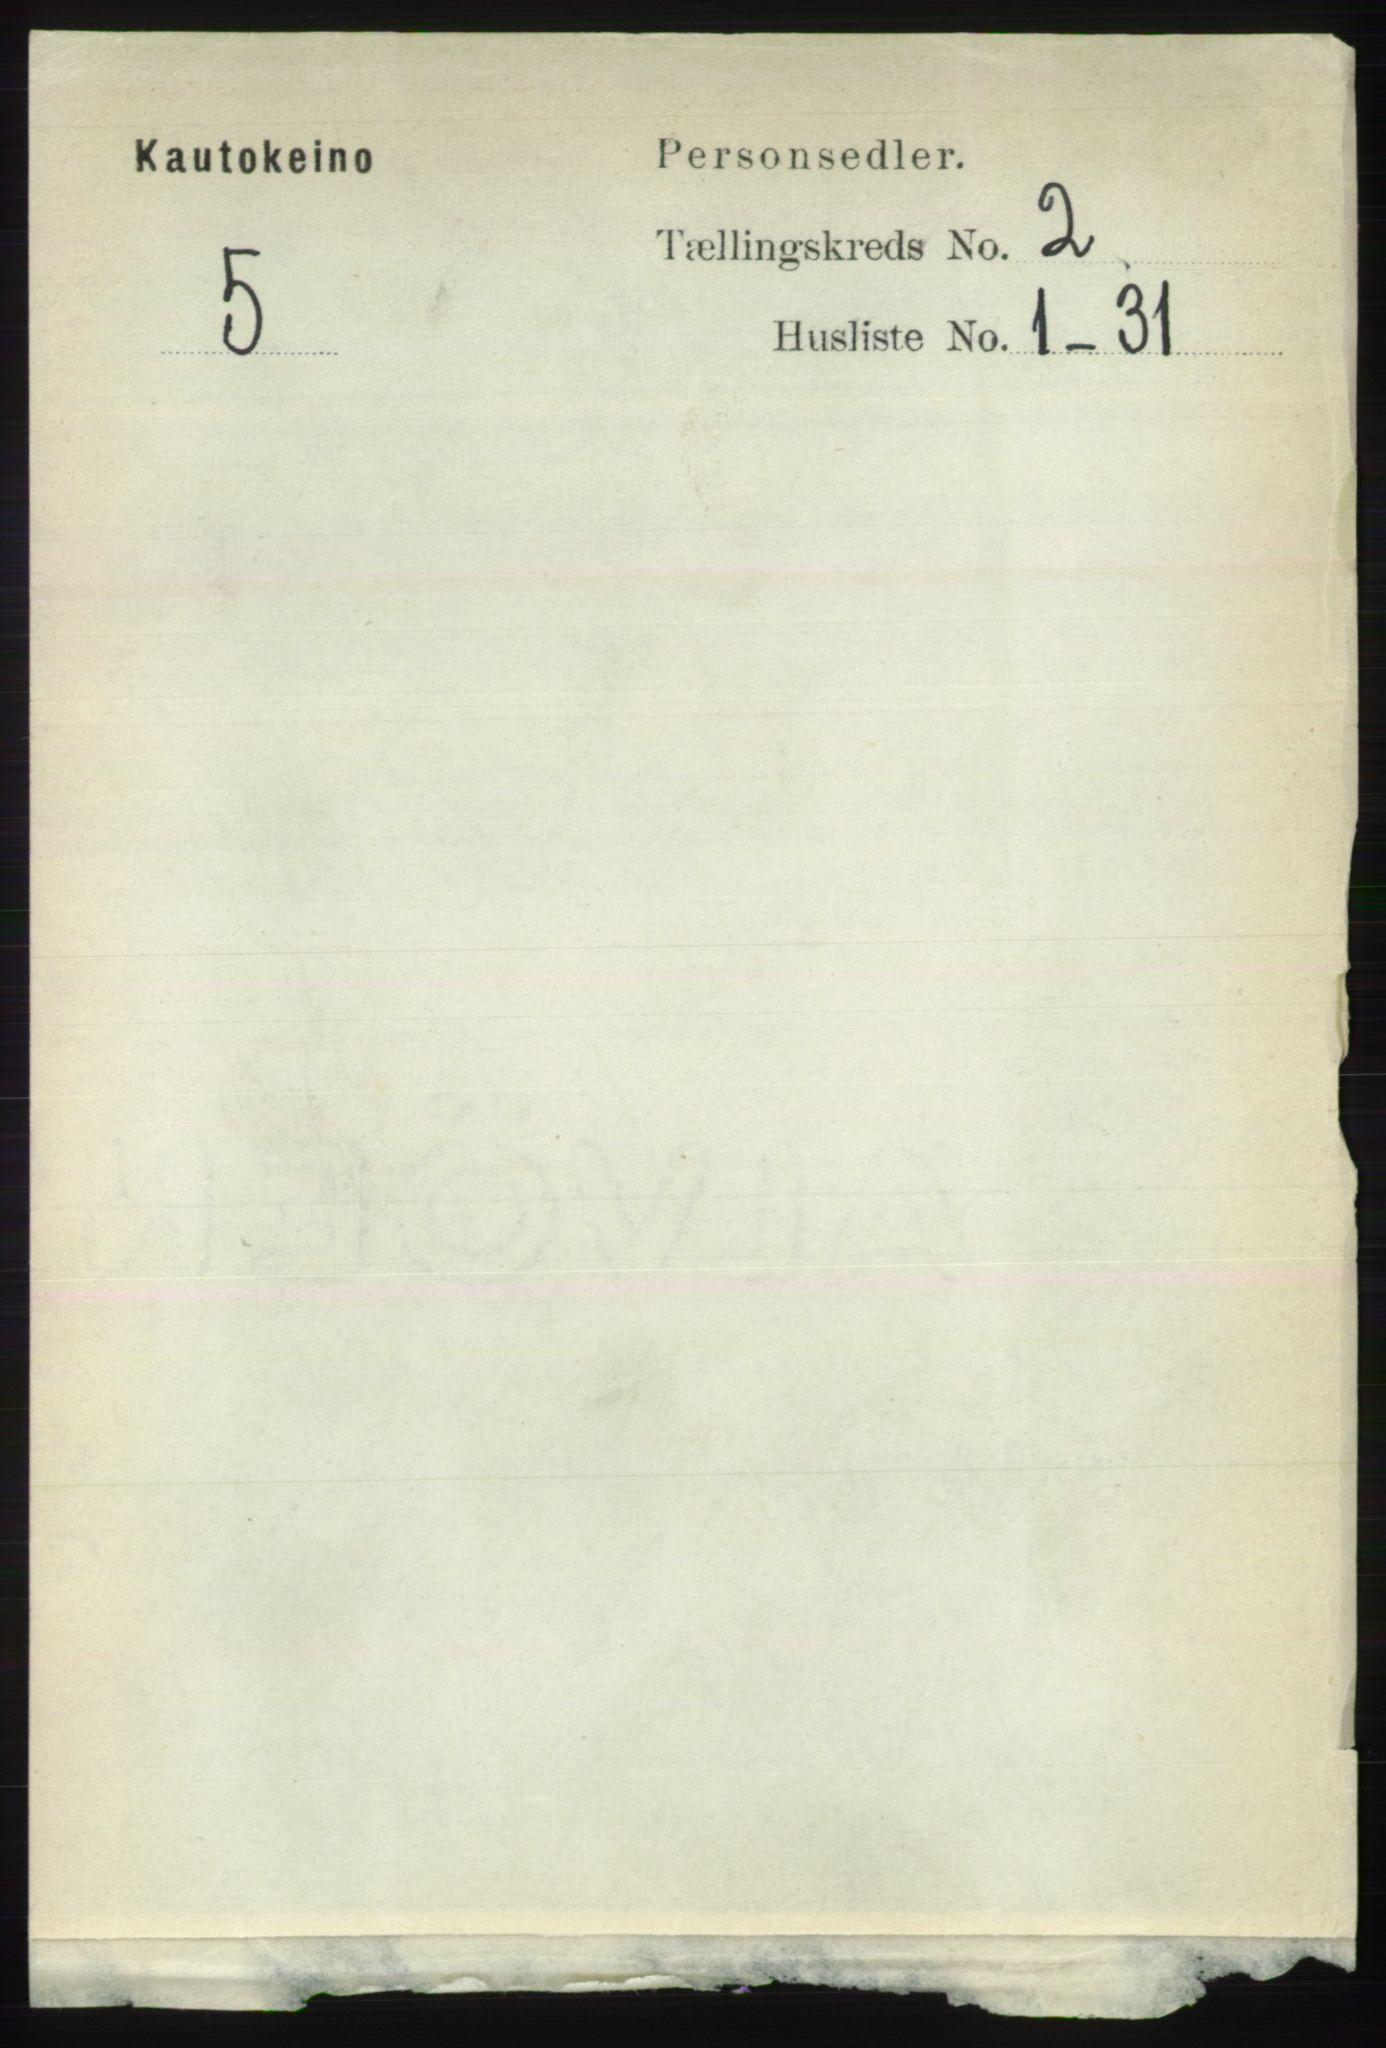 RA, Folketelling 1891 for 2011 Kautokeino herred, 1891, s. 322